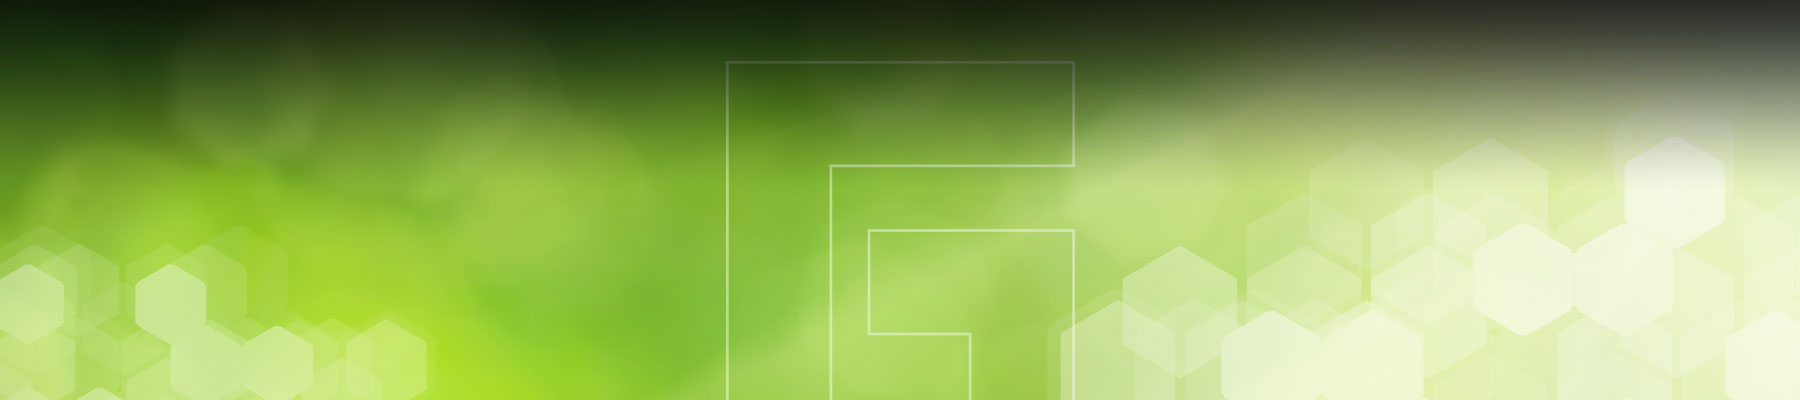 Next-Gen Agroscience Image